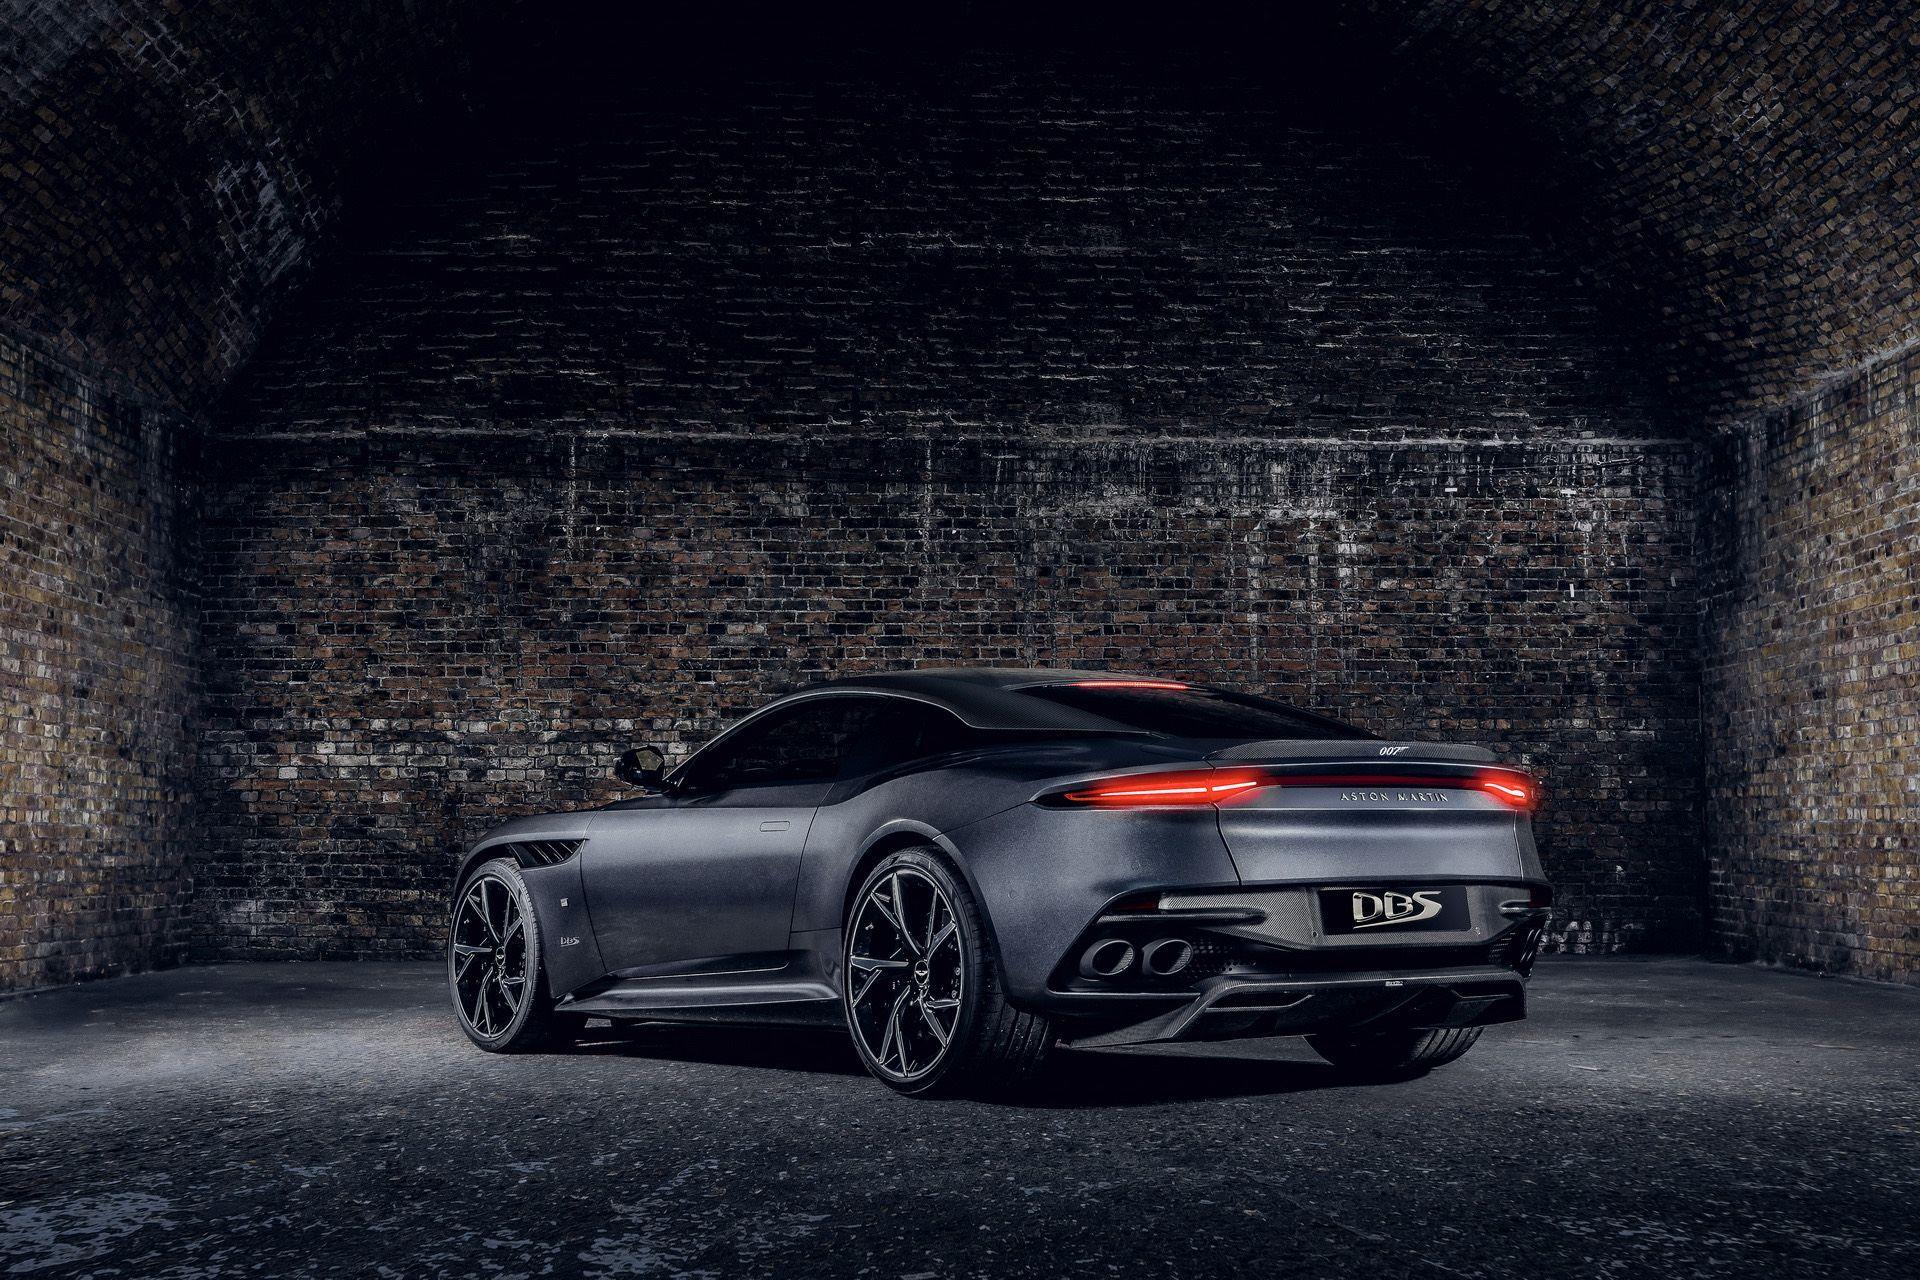 2021-aston-martin-dbs-superleggera-007-edition-4